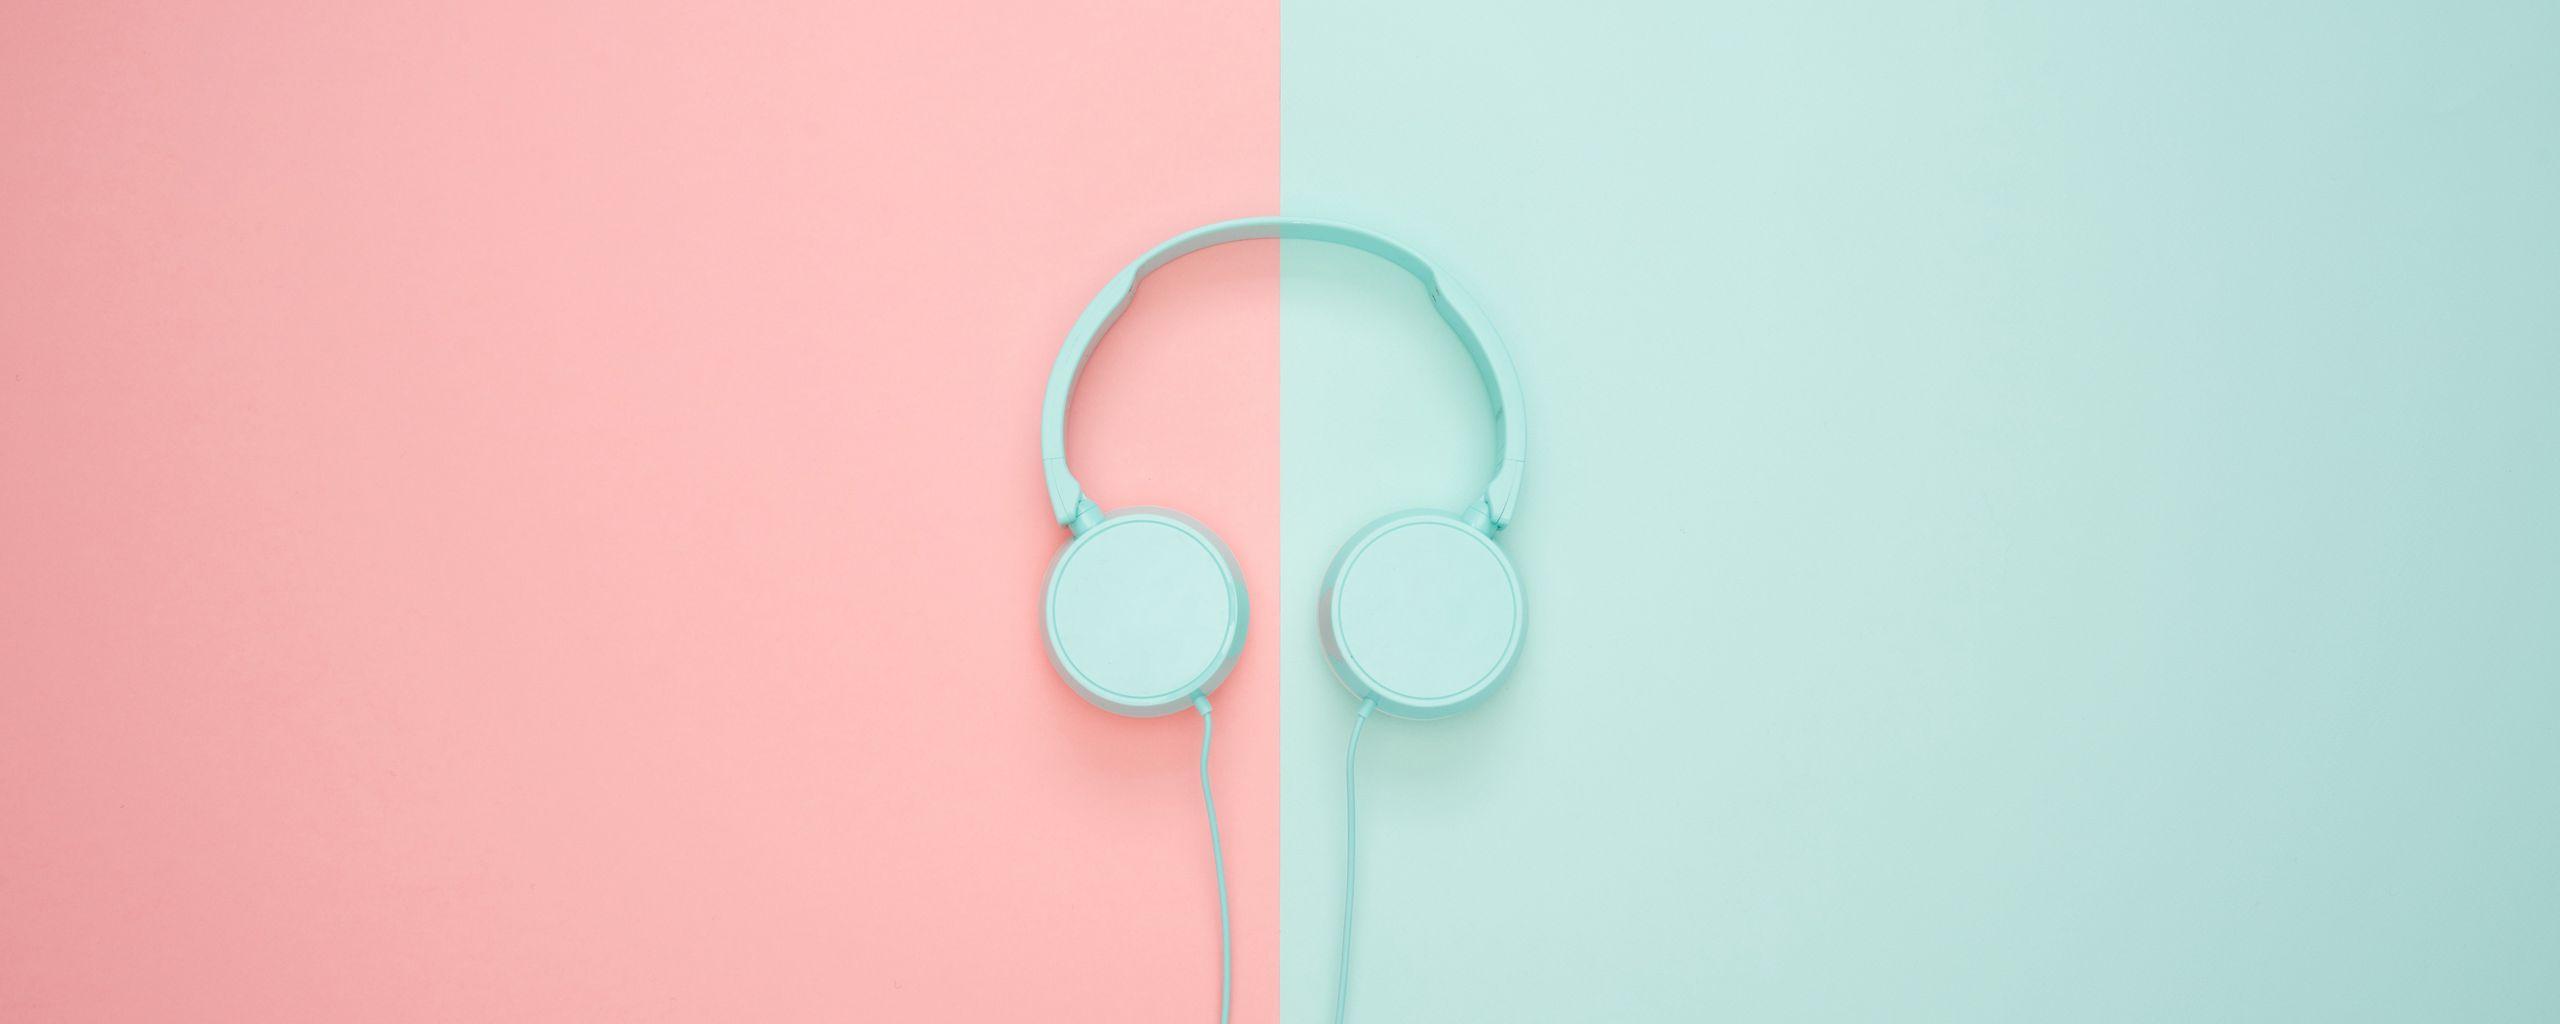 2560x1024 Wallpaper headphones, minimalism, pastel, pink